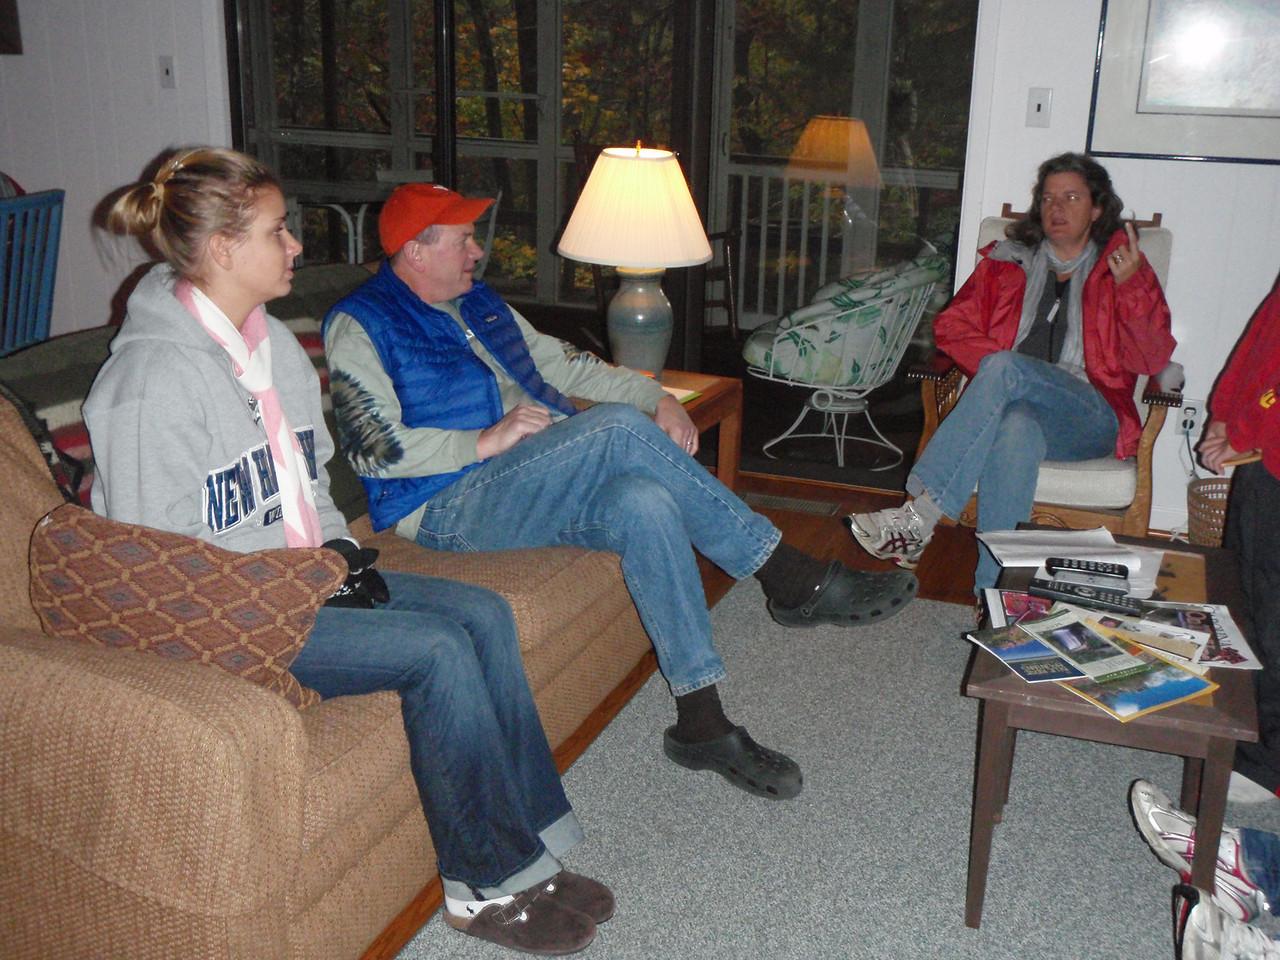 Images from Jack's Memorial Weekend: Saturday